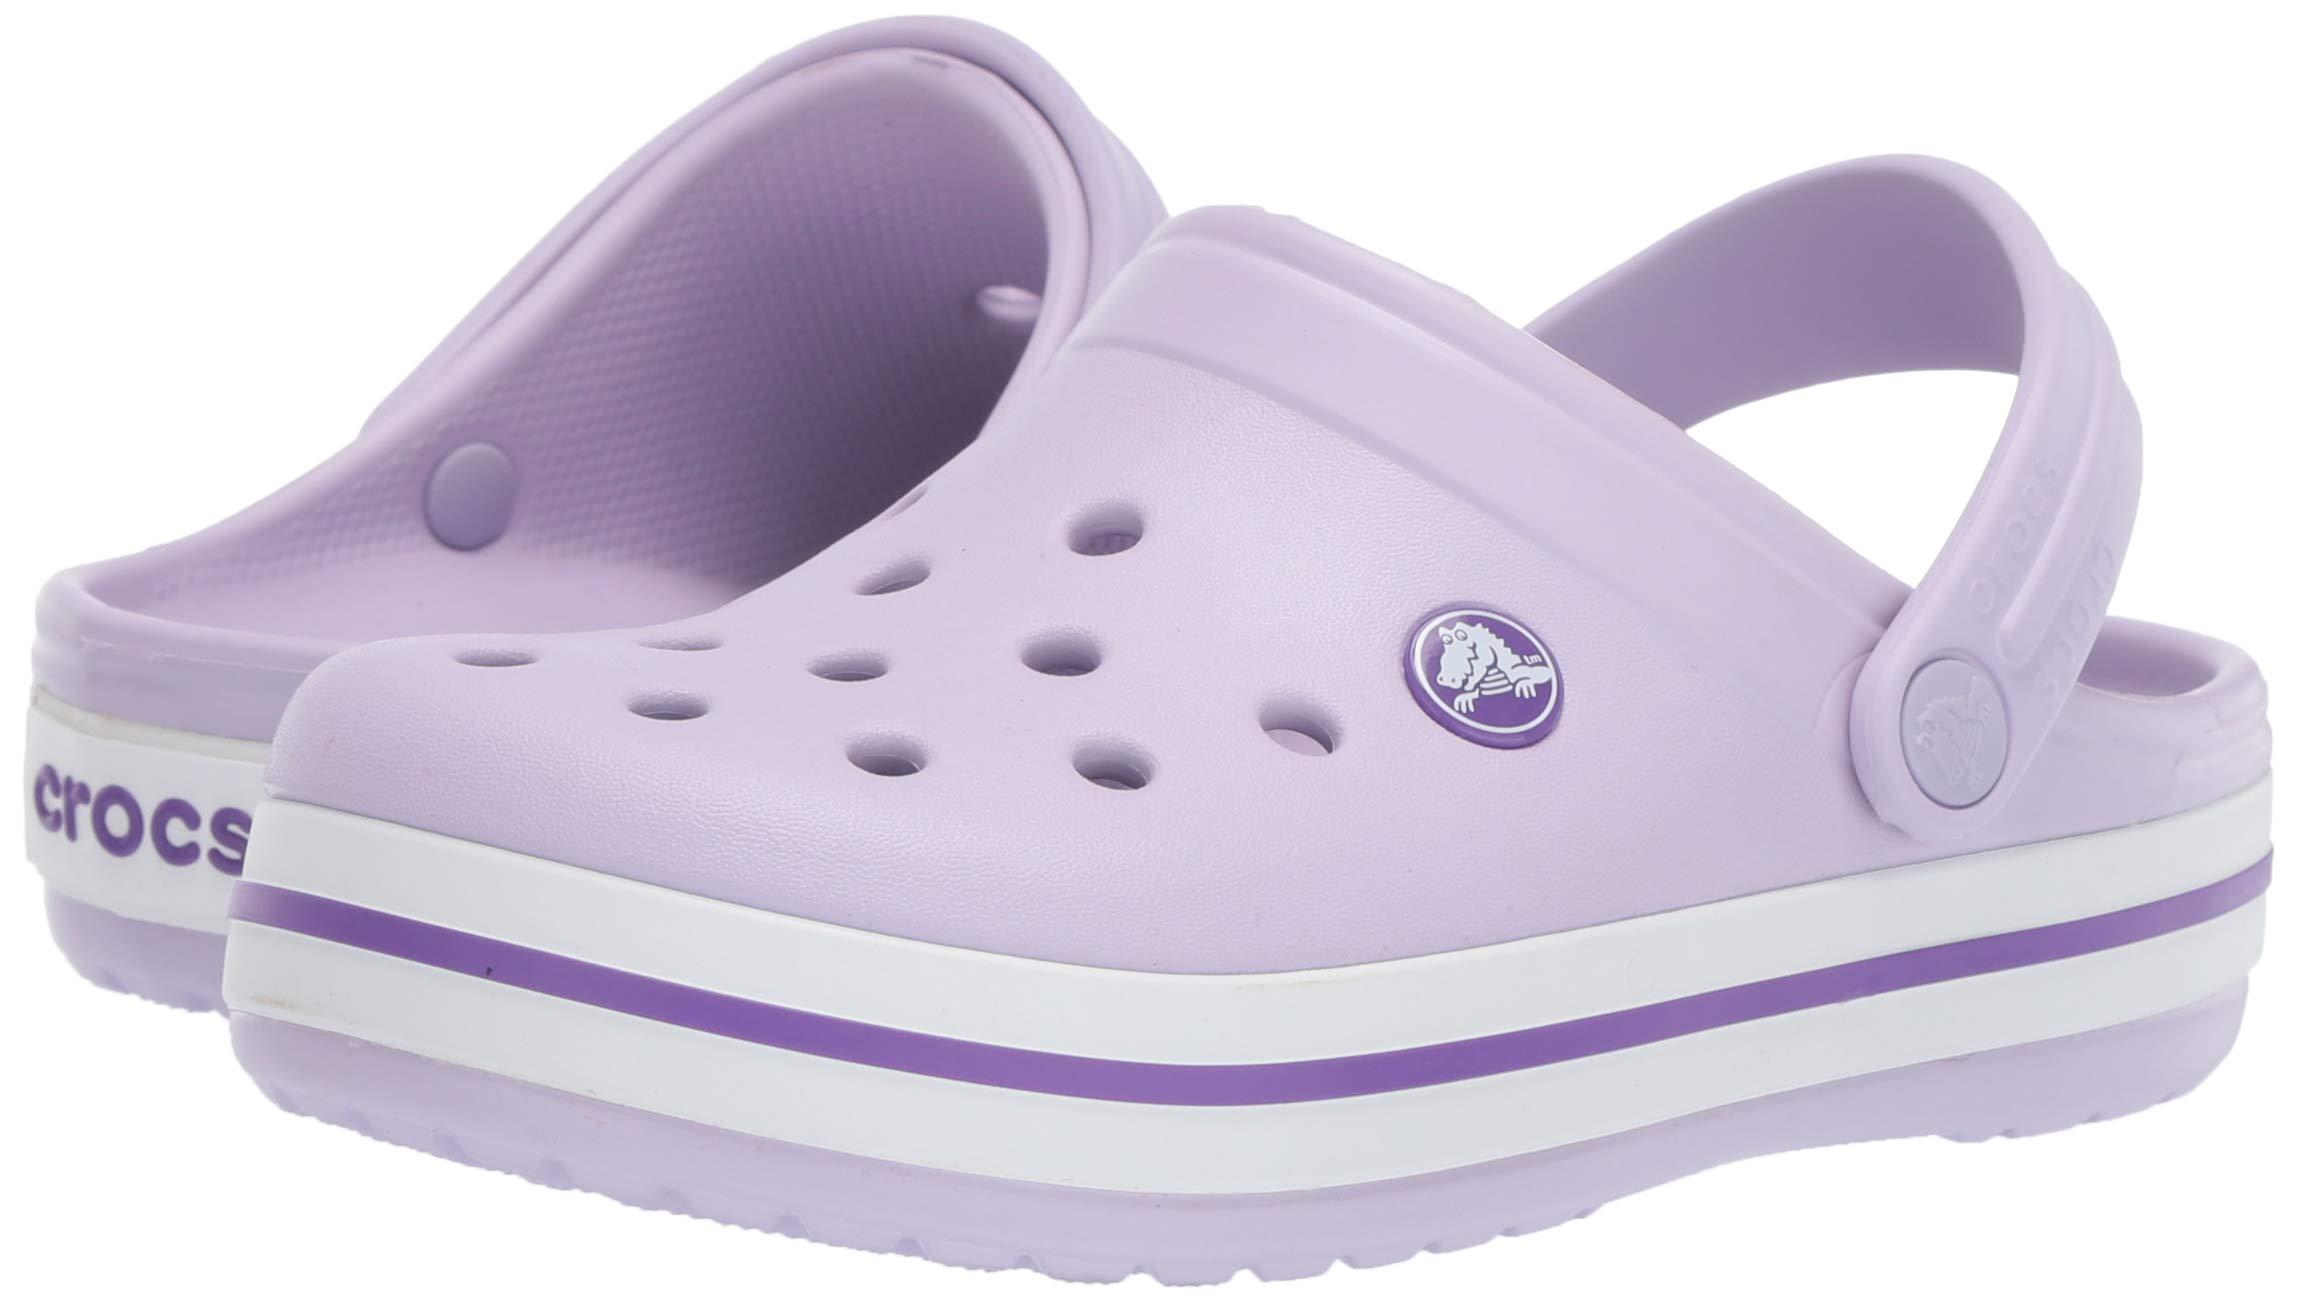 Crocs Kids' Crocband Clog, Lavender/Neon Purple, 10 M US Toddler by Crocs (Image #6)